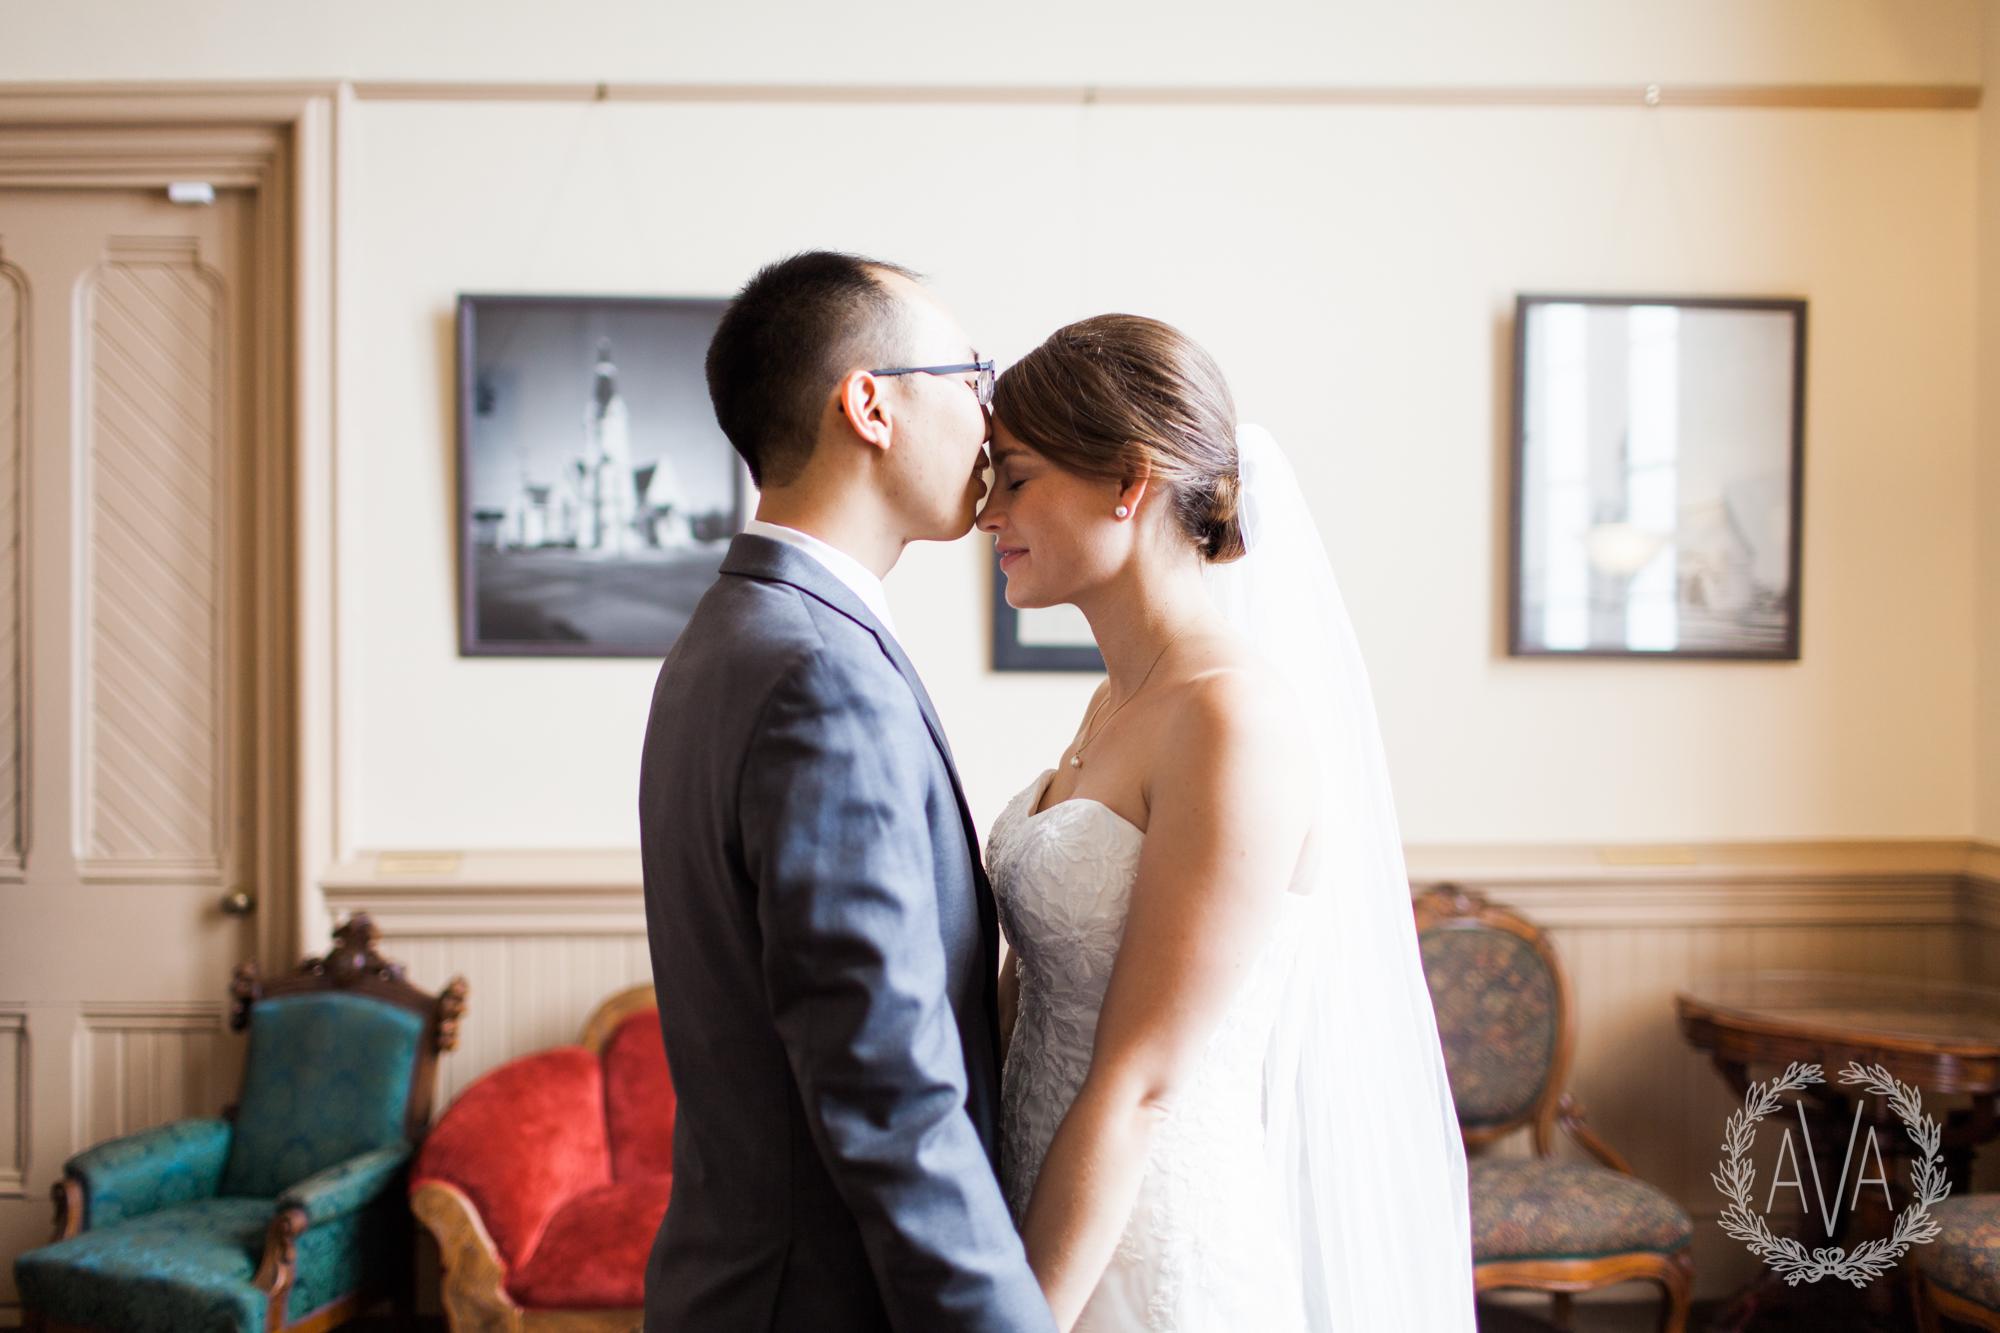 ava_chiew_wedding-14.jpg